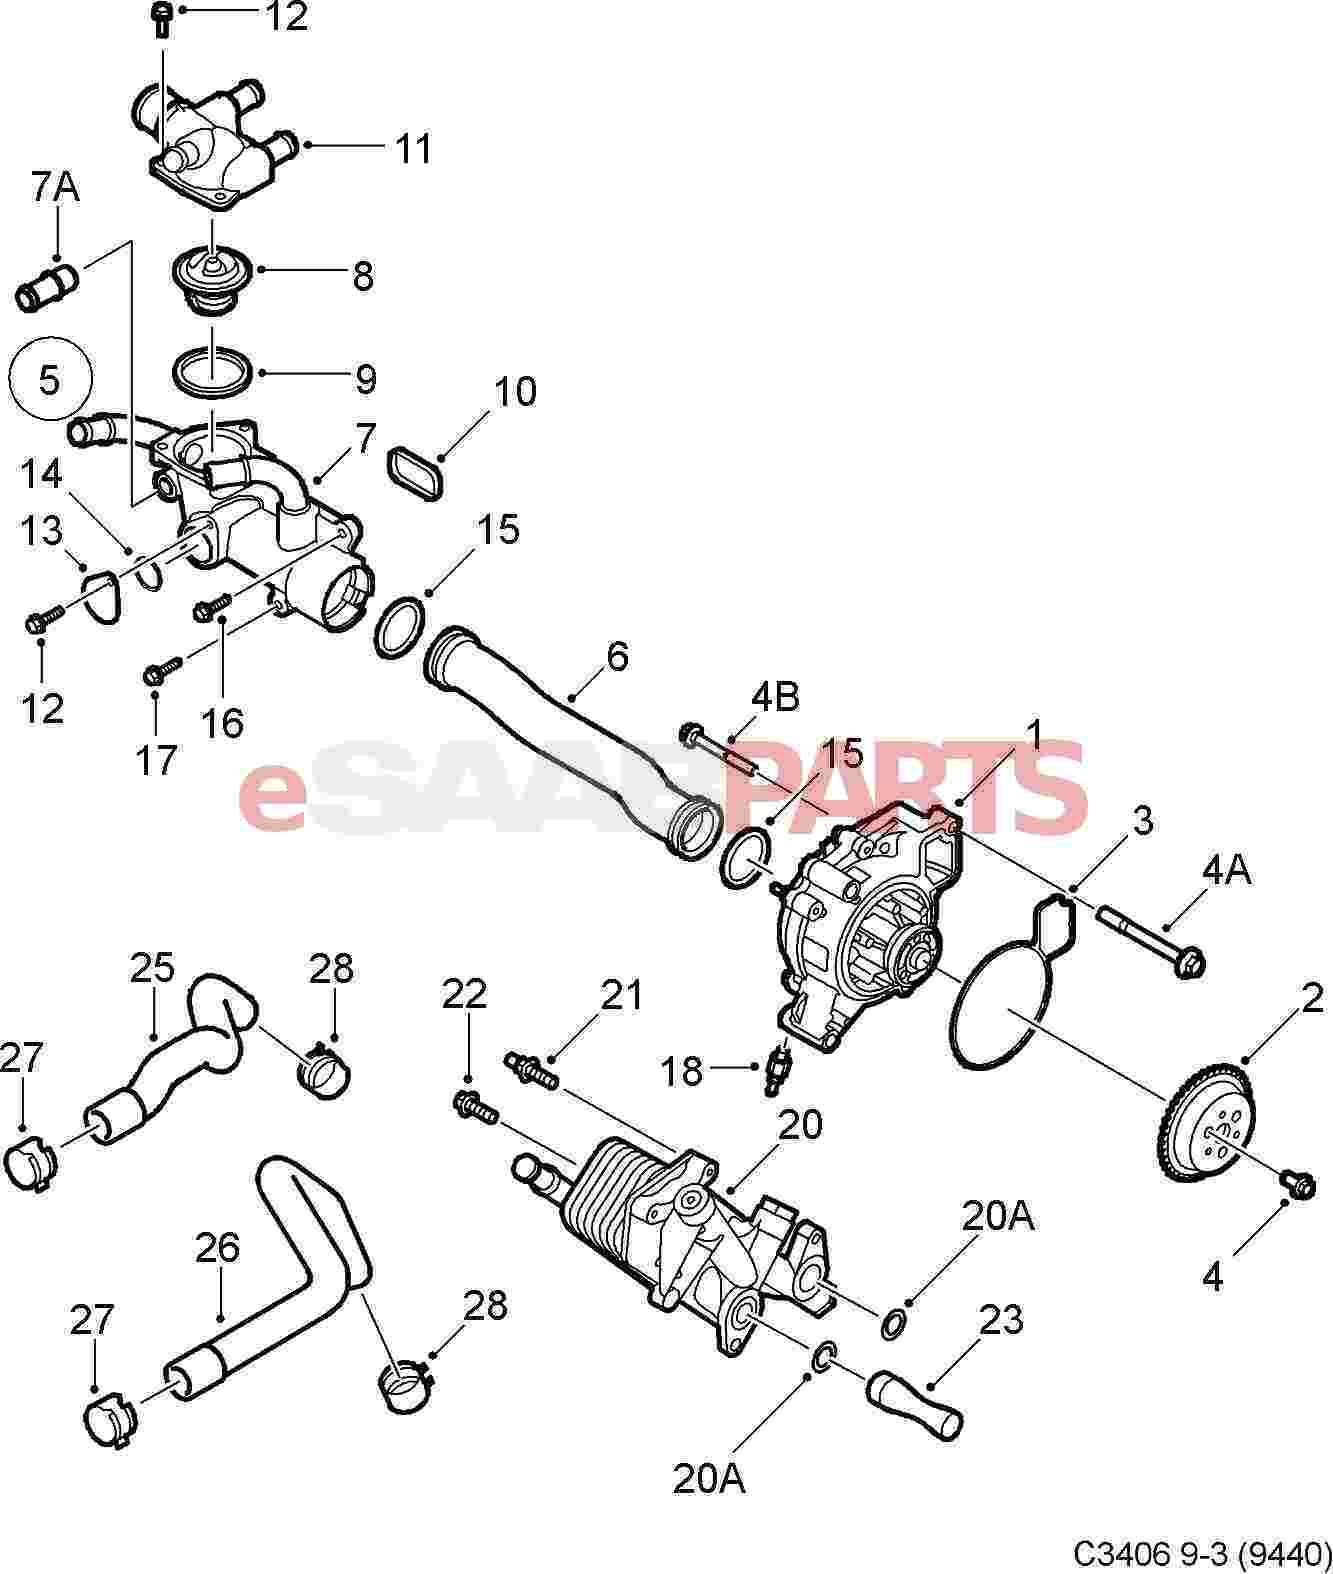 2004 saab 9 3 wiring diagram visual studio class association arc engine auto